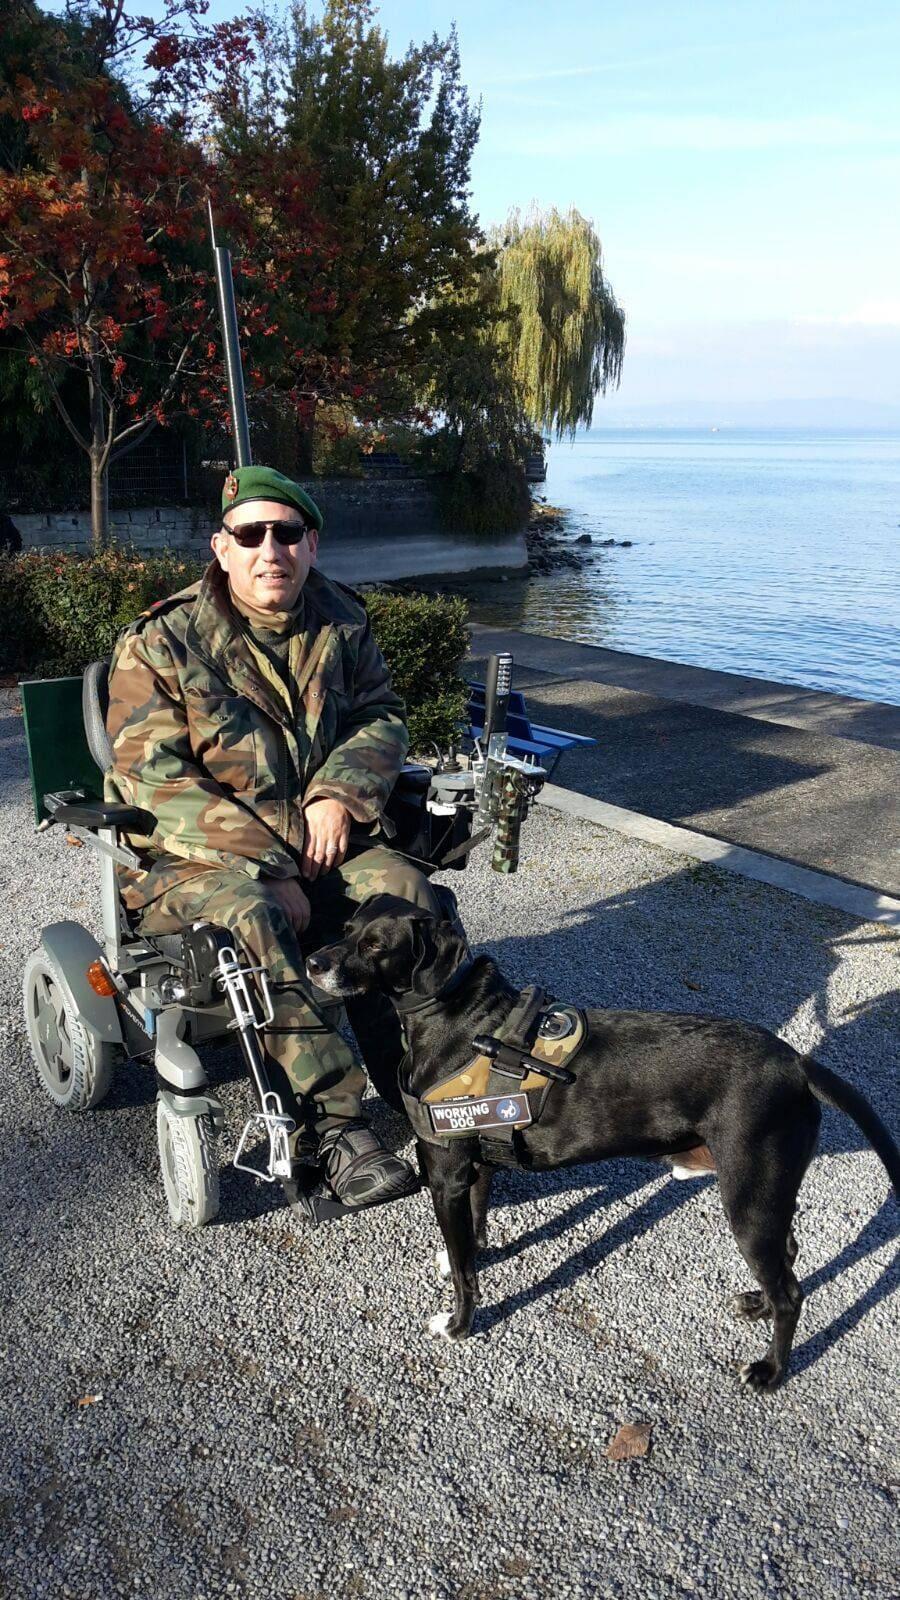 Thurgauer Rollstuhlfahrer wird erneut terrorisiert